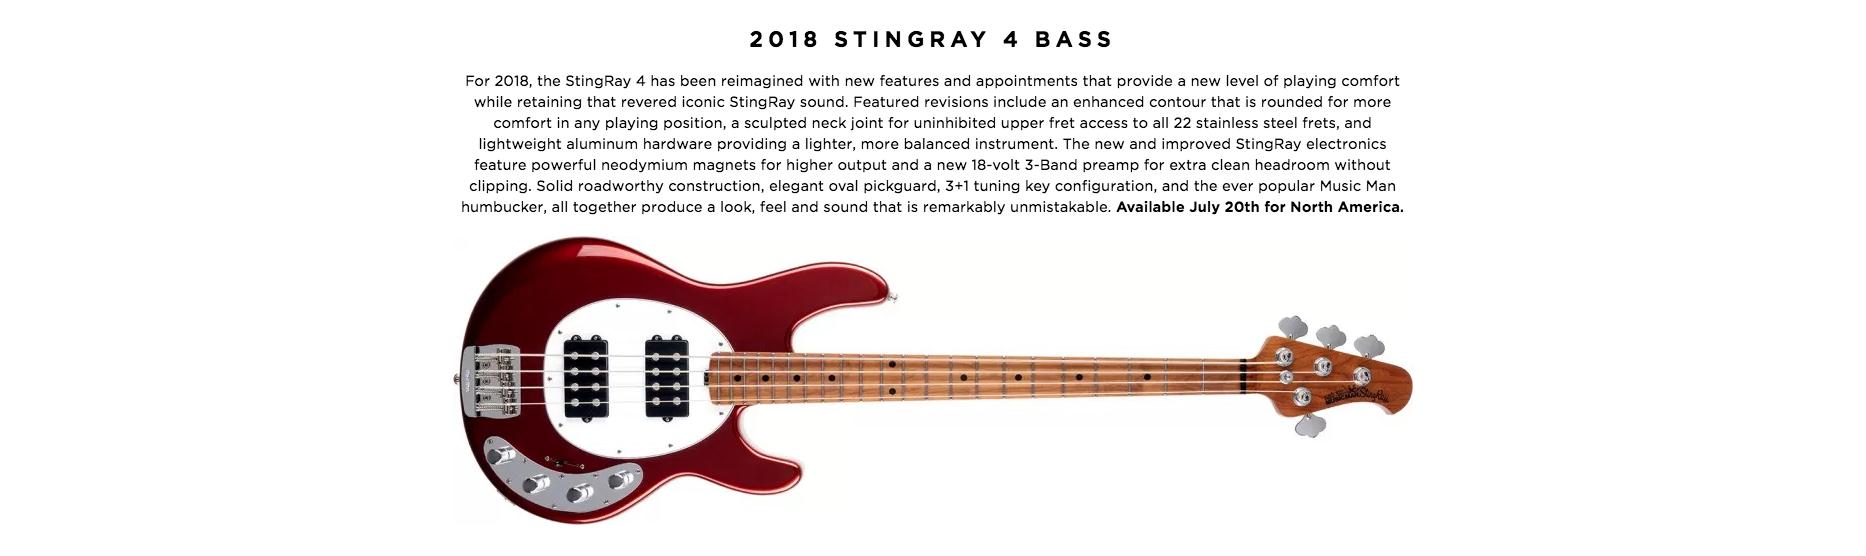 2018 STINGRAY 4 BASS